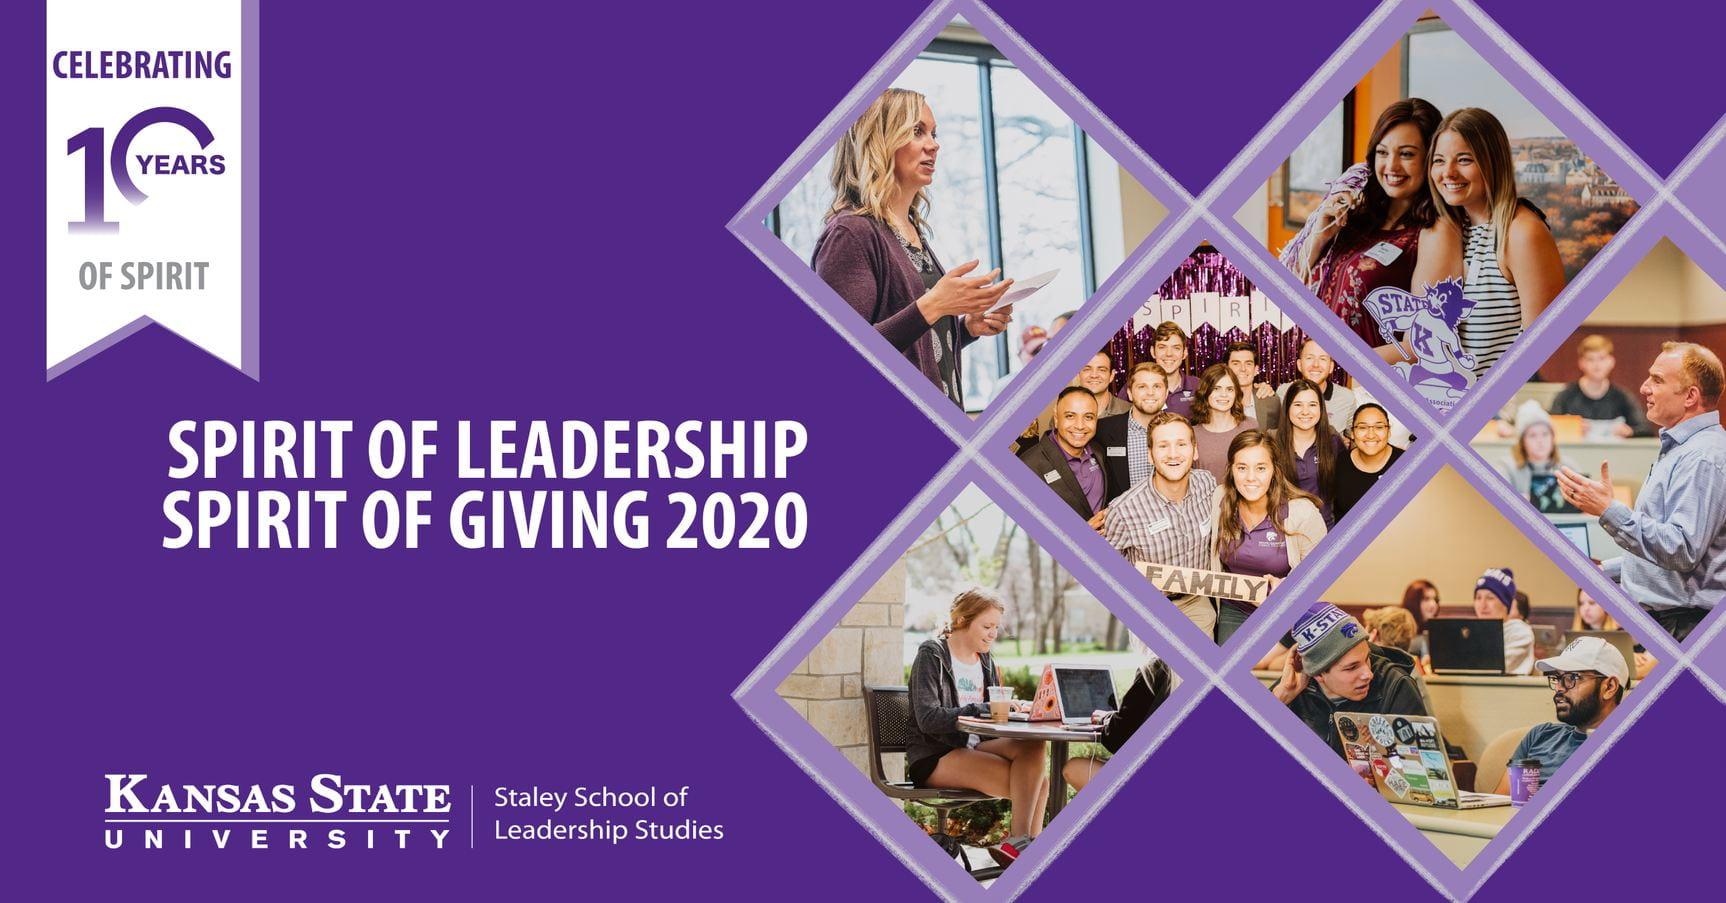 Spirit of Leadership | Spirit of Giving 2020